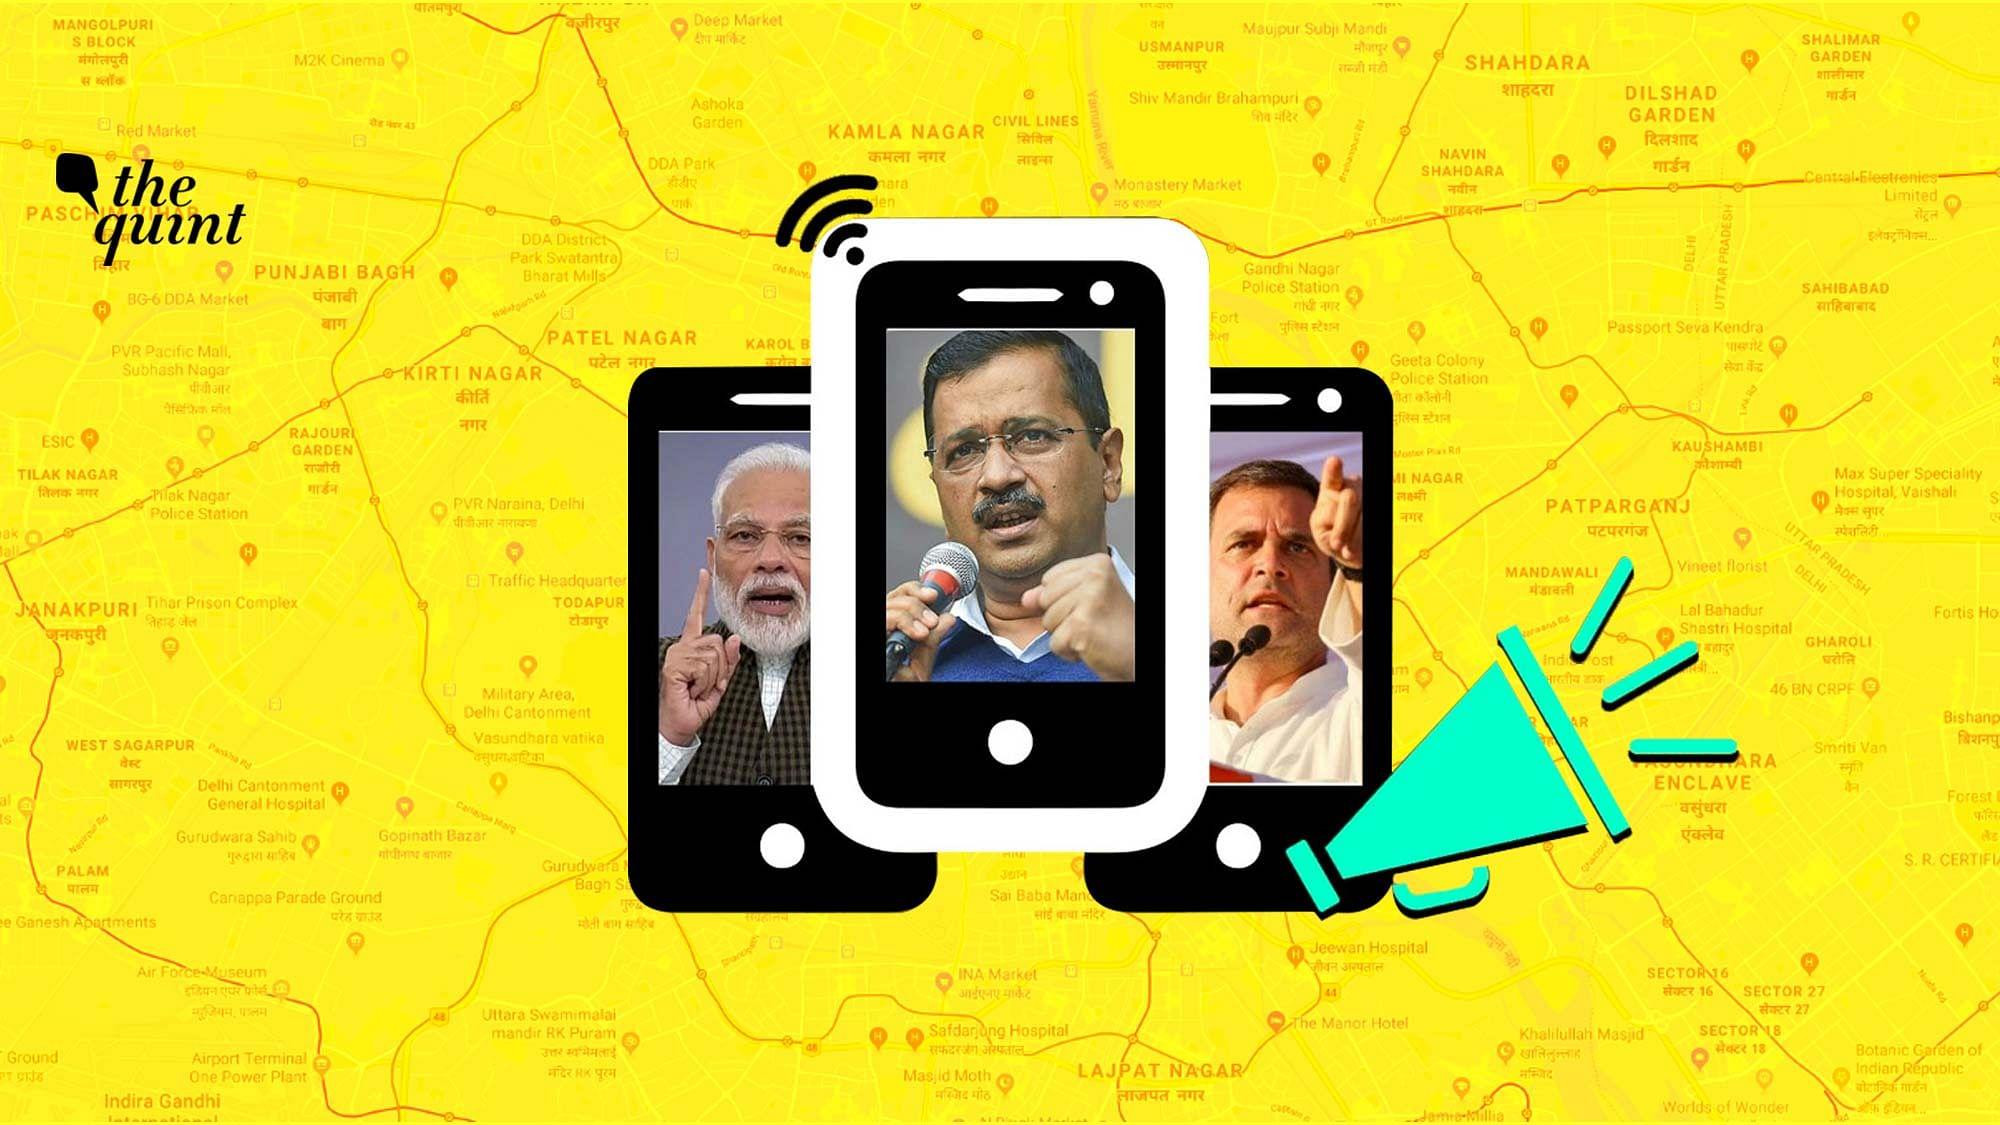 INDIA NEWS & VIEWS EDITORIALS - cover